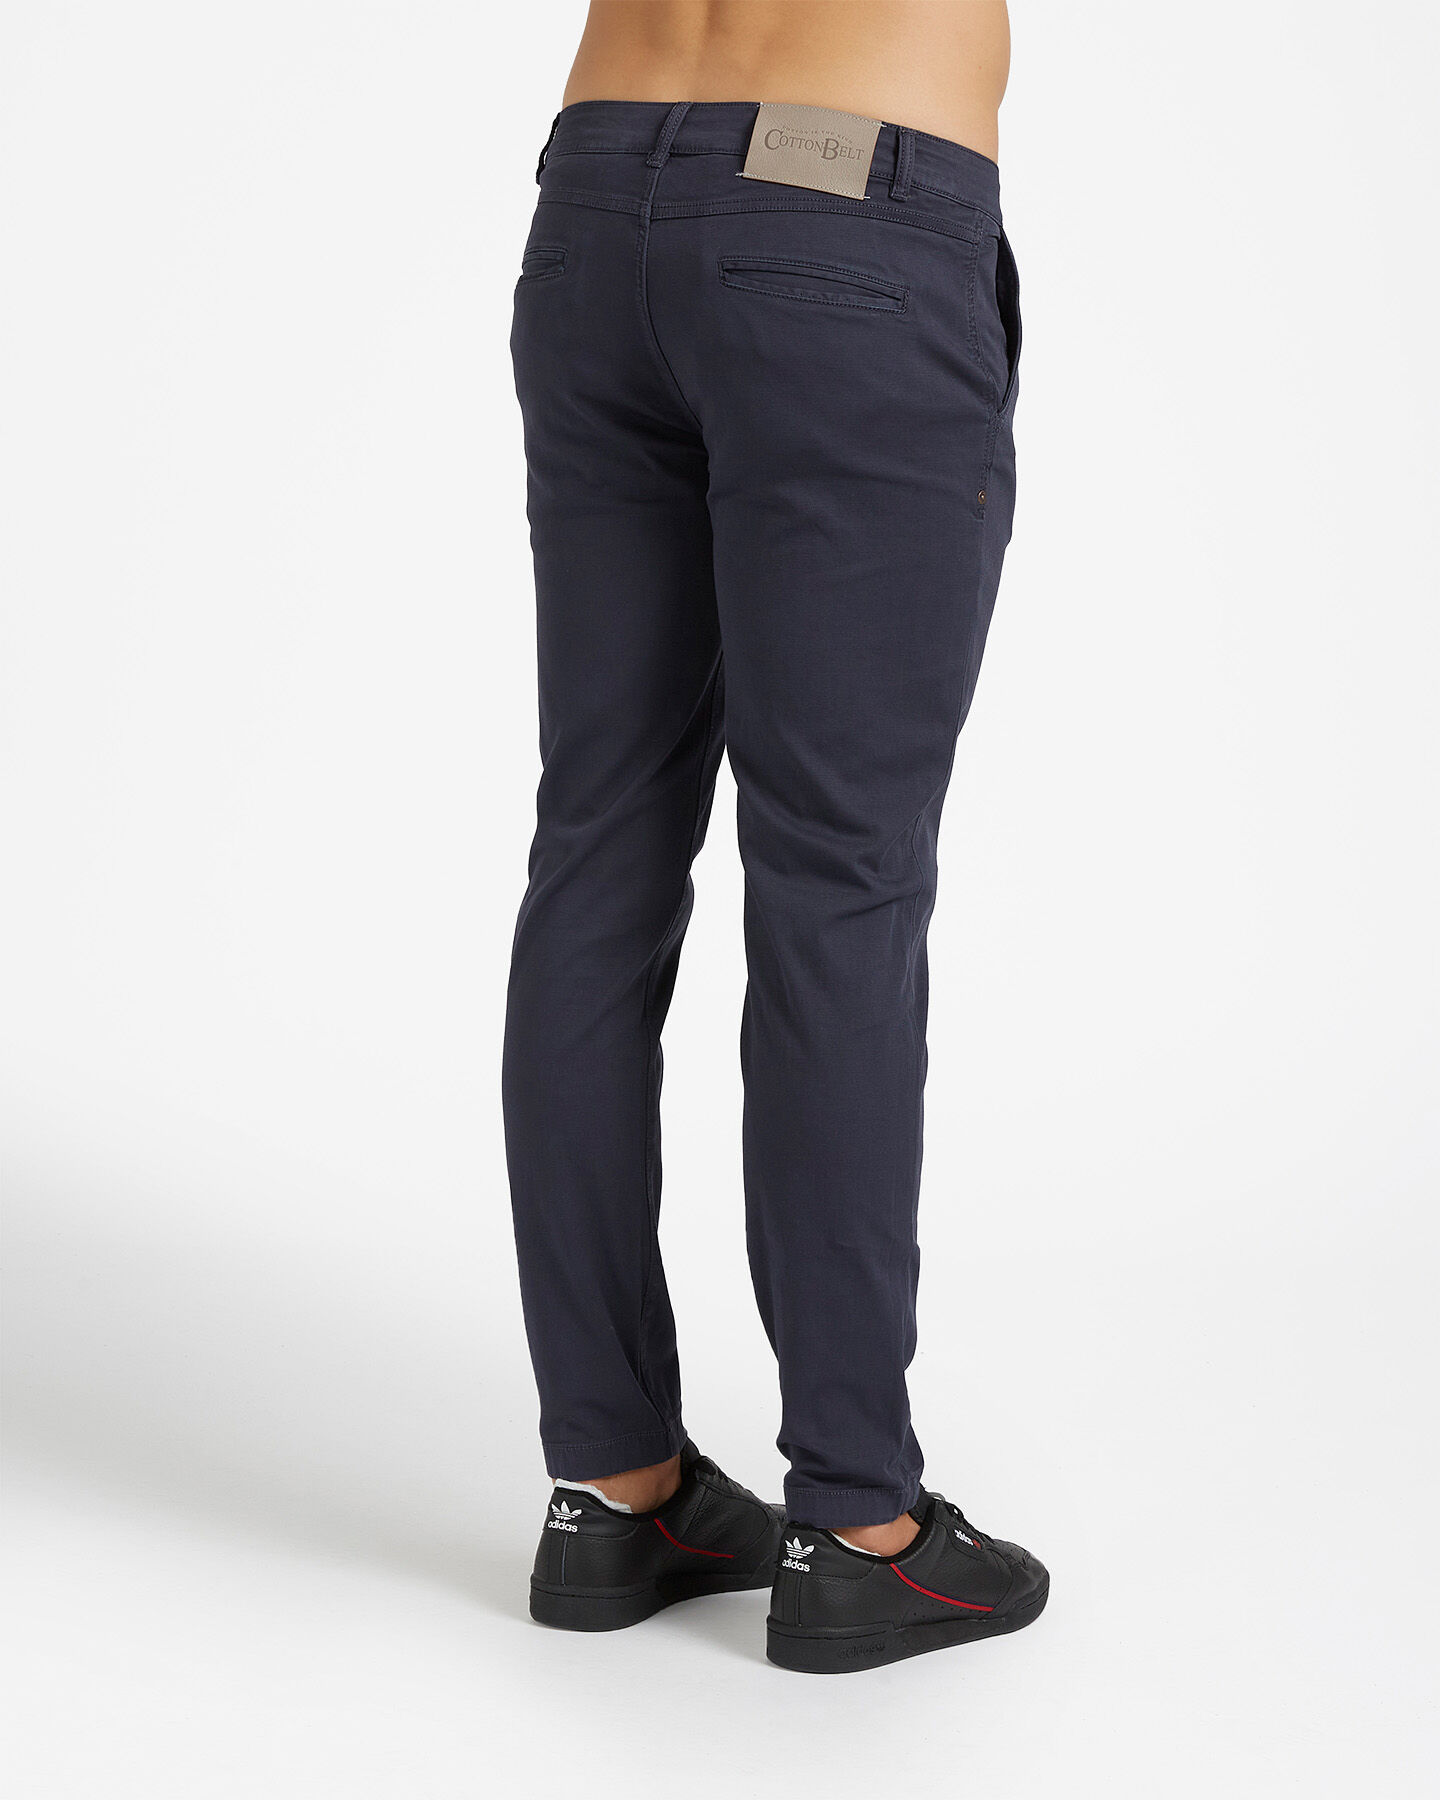 Pantalone COTTON BELT CHINO SLIM M S4076641 scatto 1